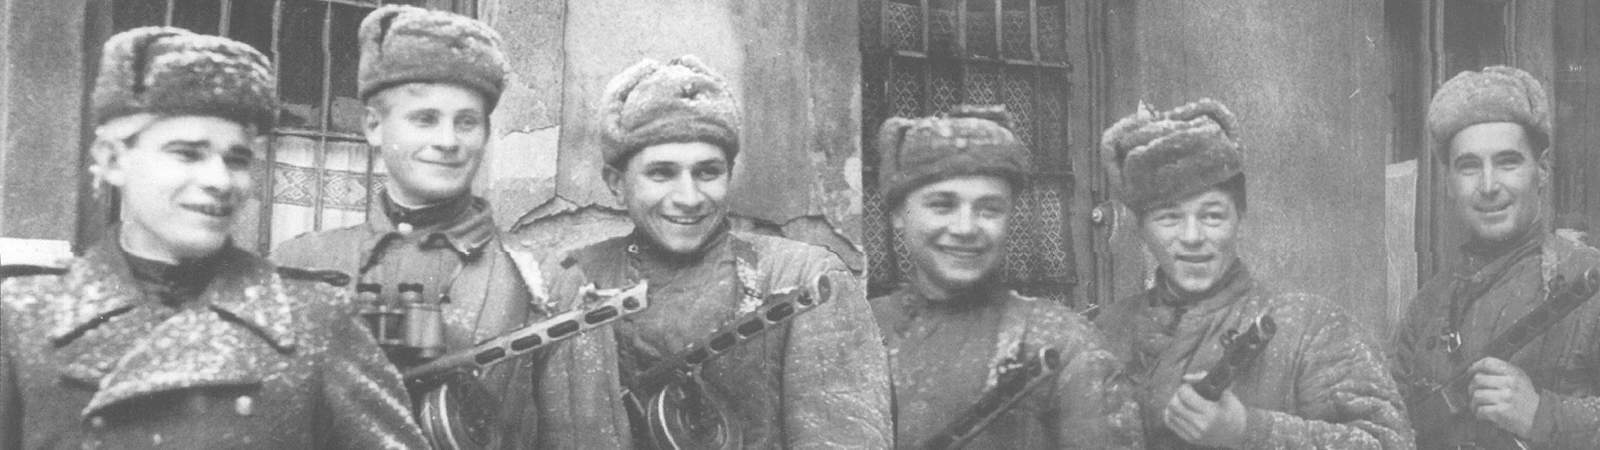 Разведка, 1941 год